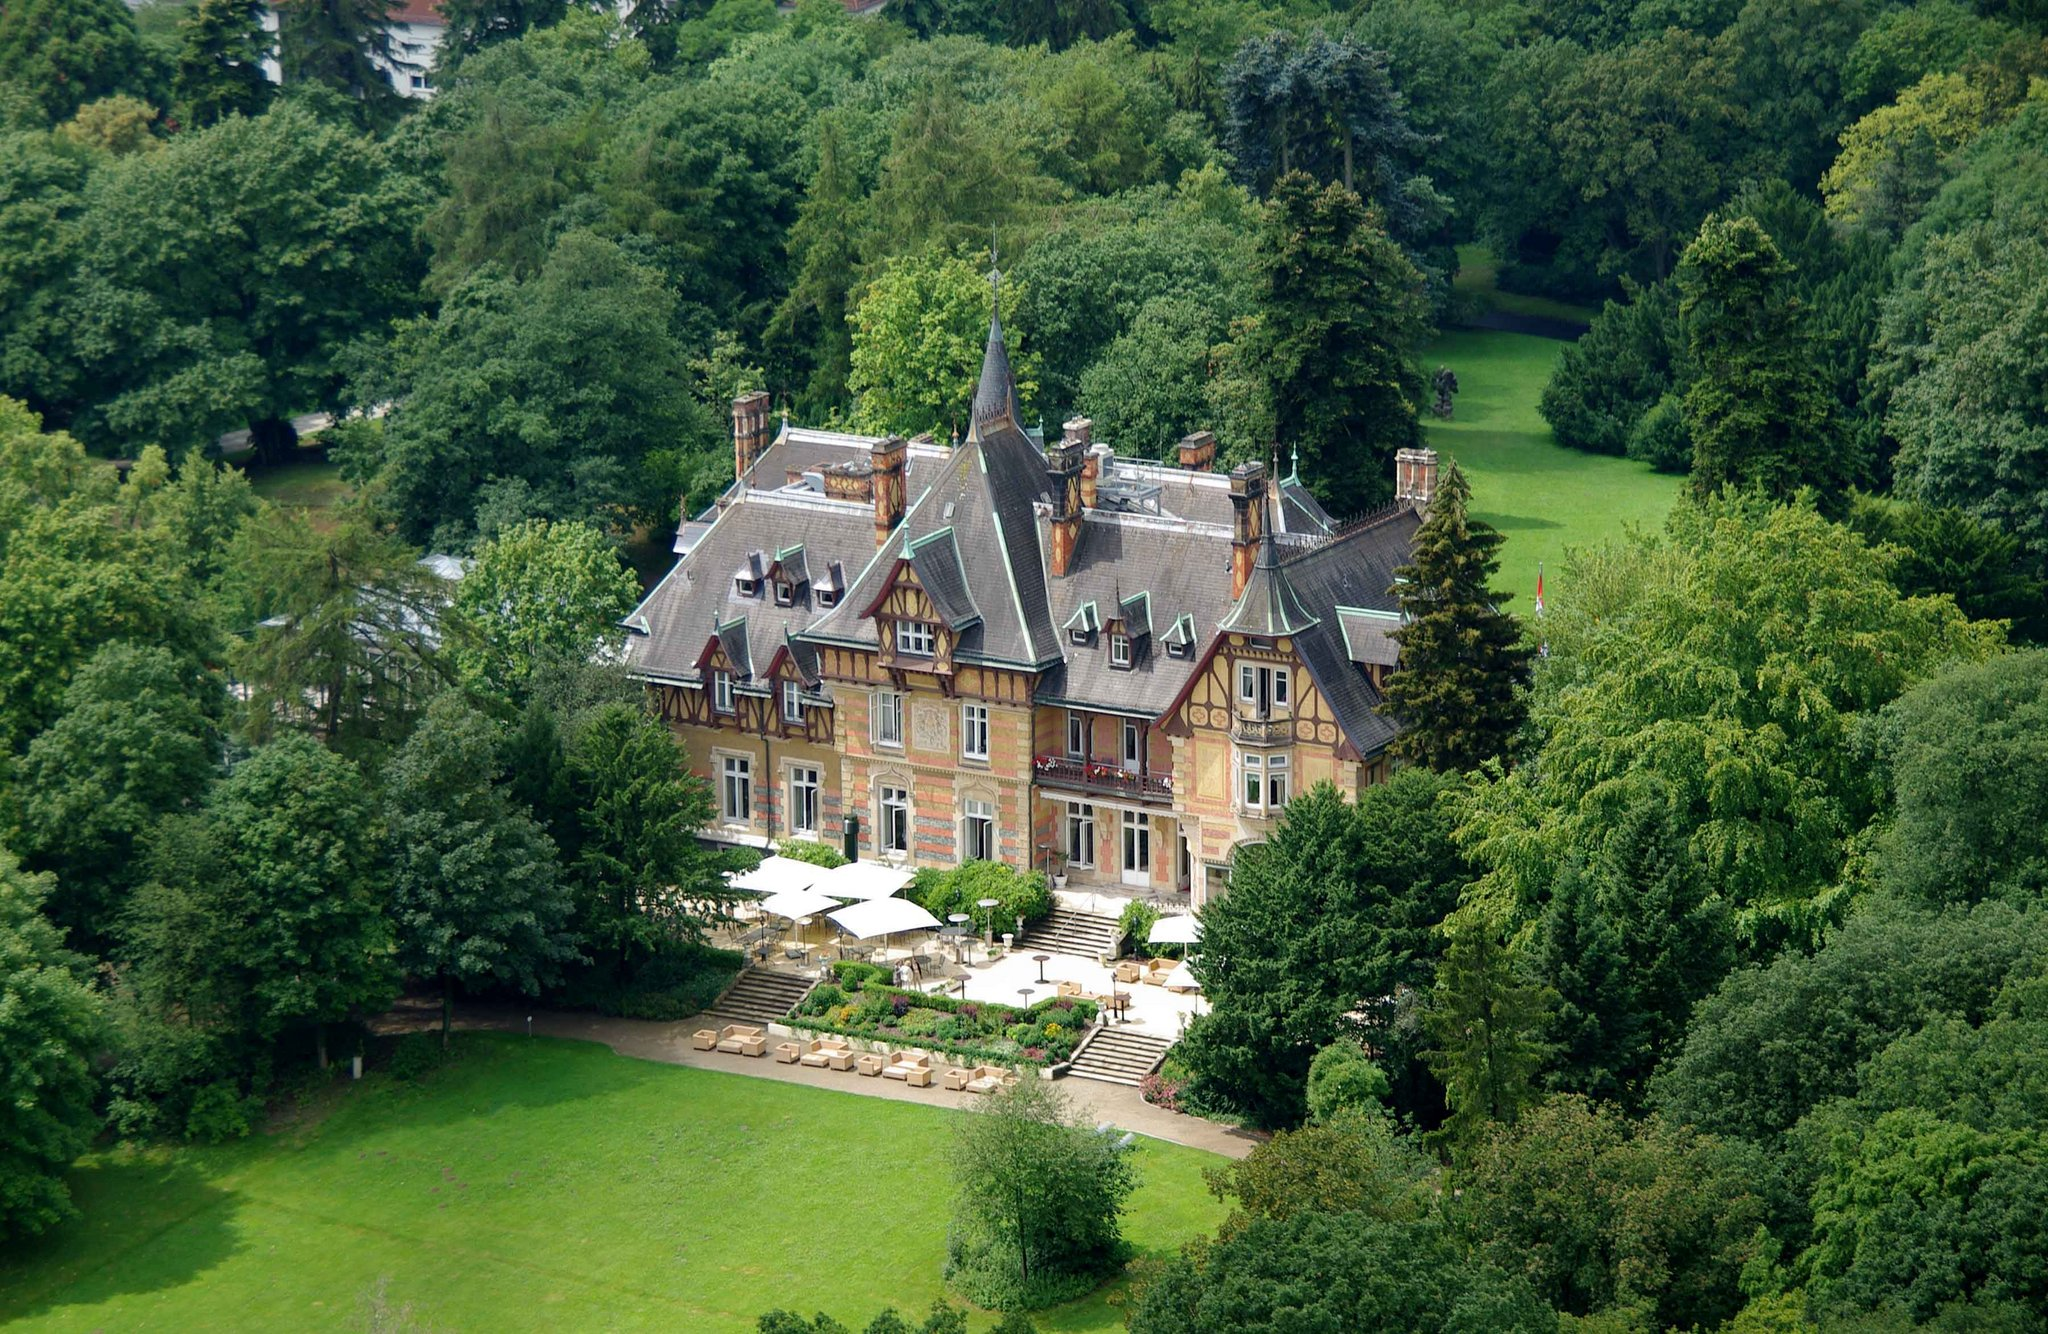 Germany Castles The Villa Rothschild